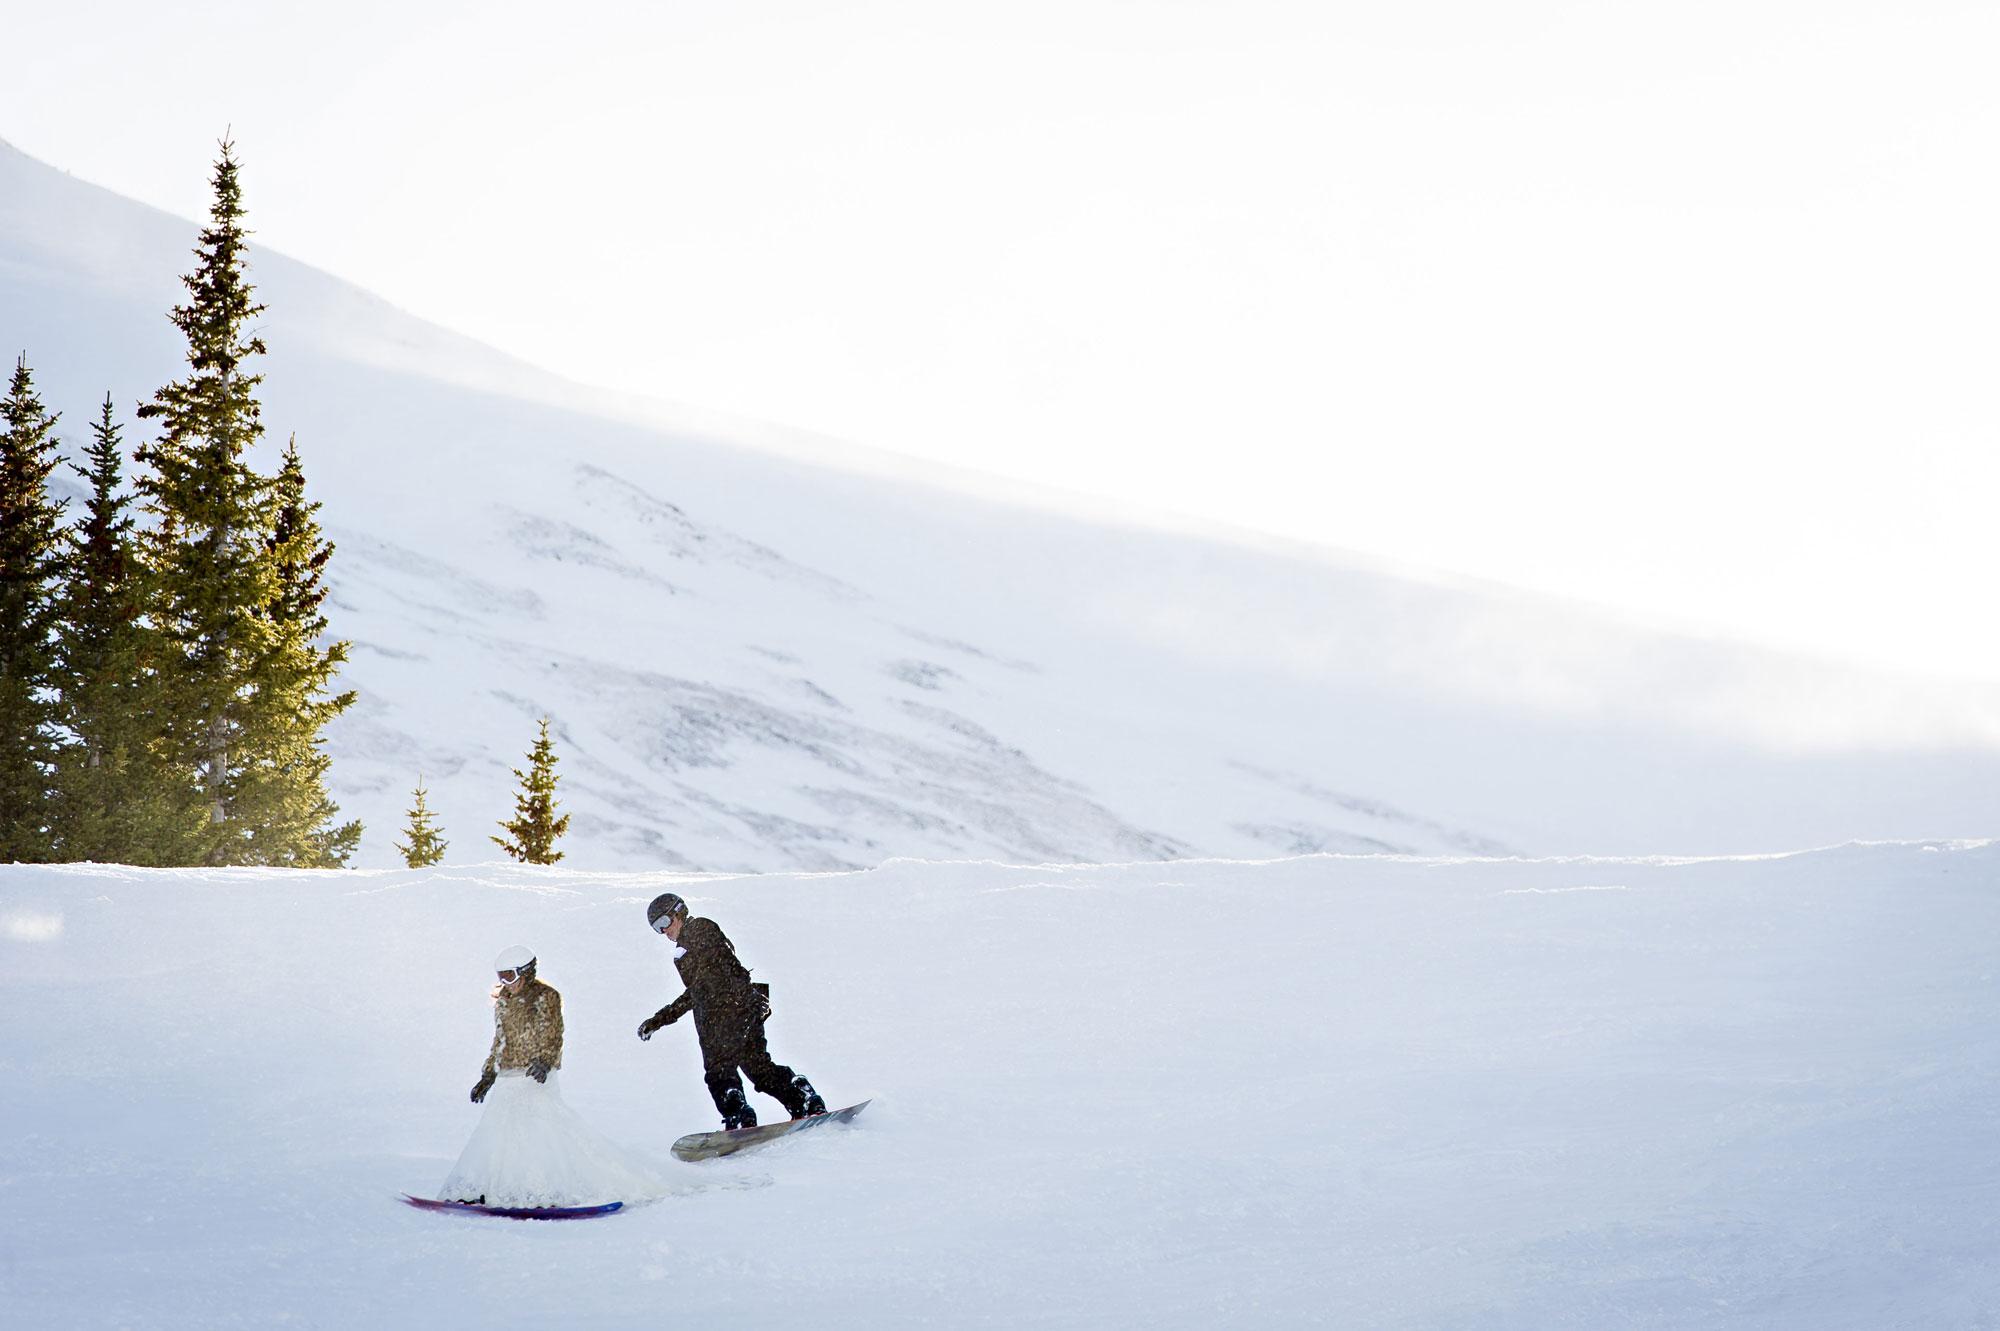 A Winter Wedding with a Snowboarding Bride & Groom in Breckenridge, CO